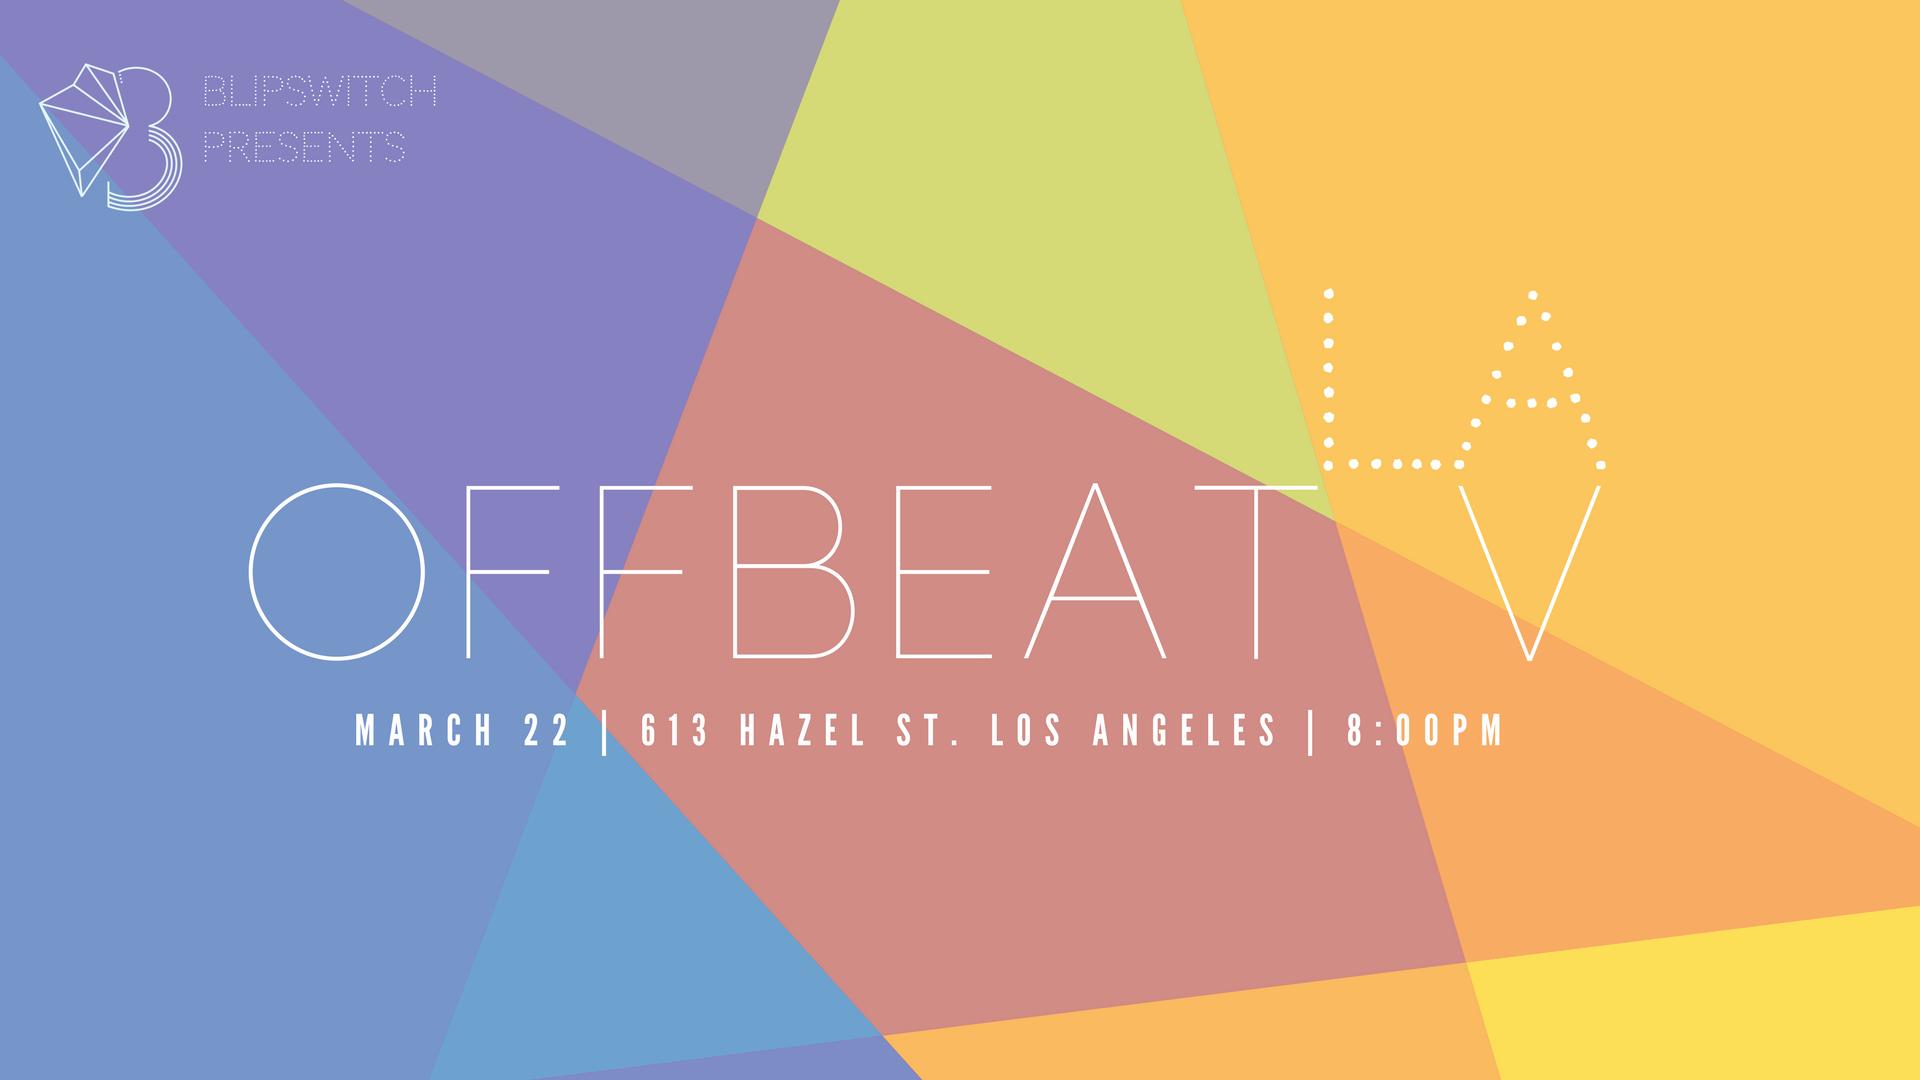 BLiPSWiTCH presentsOffbeat V - March 22, 2018Los Angeles, CA